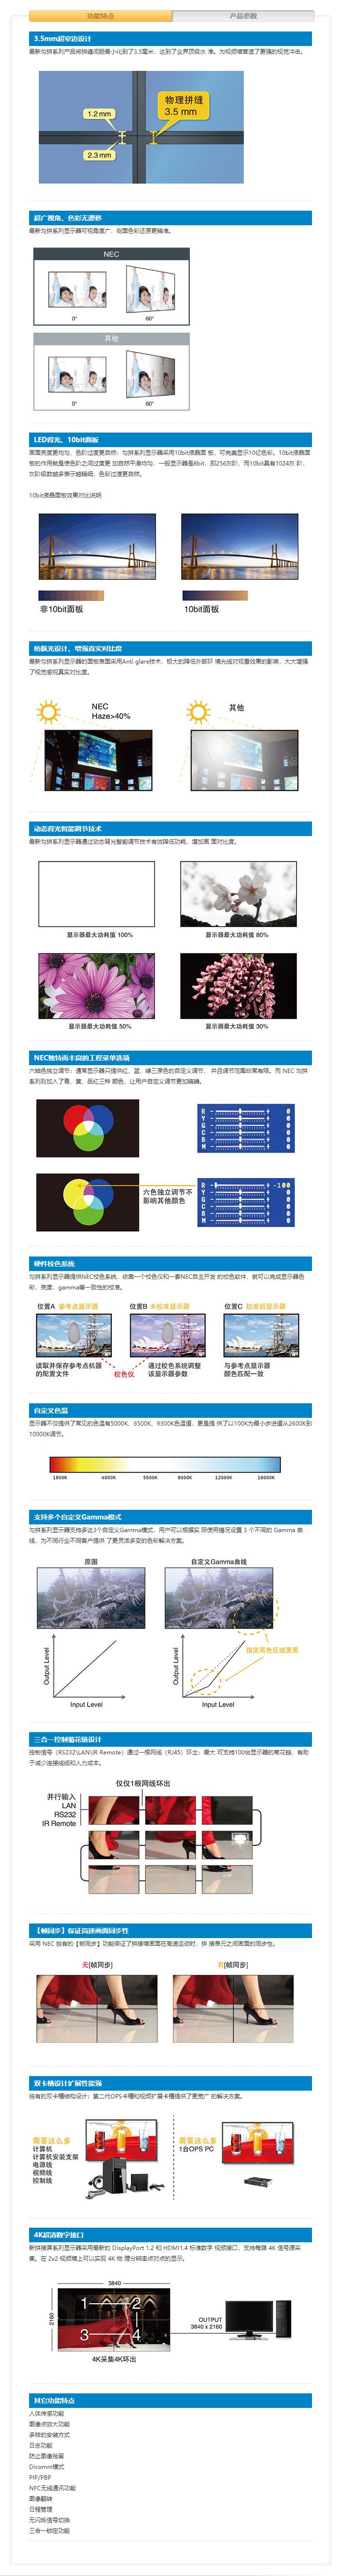 NEC显示器_产品_X555UNS